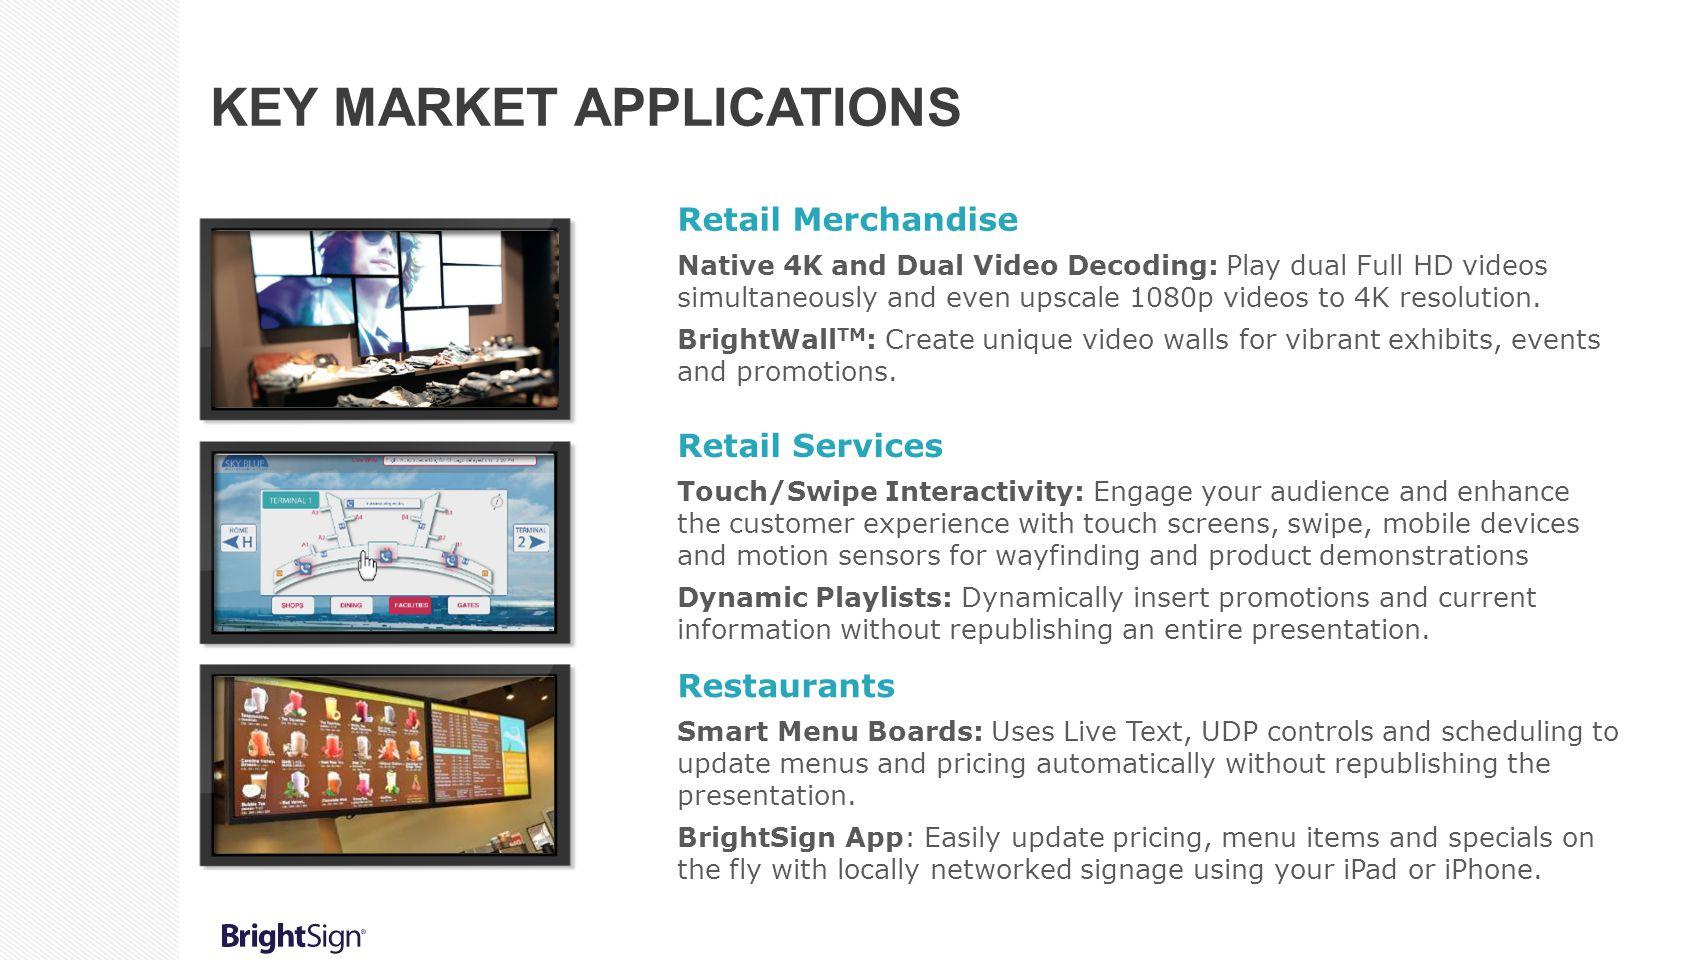 Key market applications